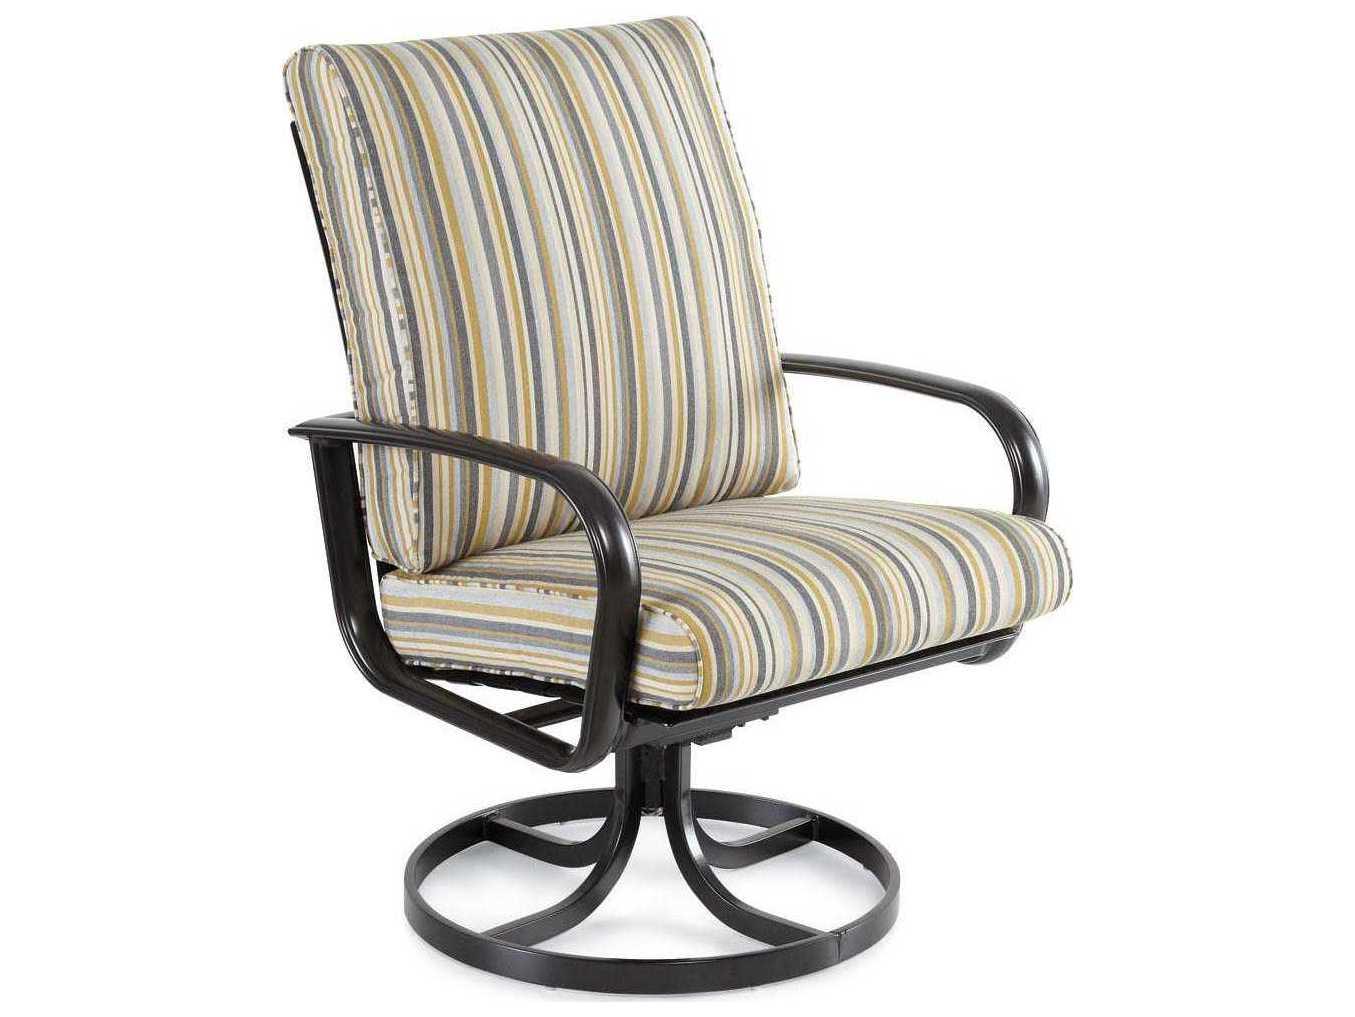 swivel chair cushions matrix fishing winston savoy cushion aluminum high back tilt